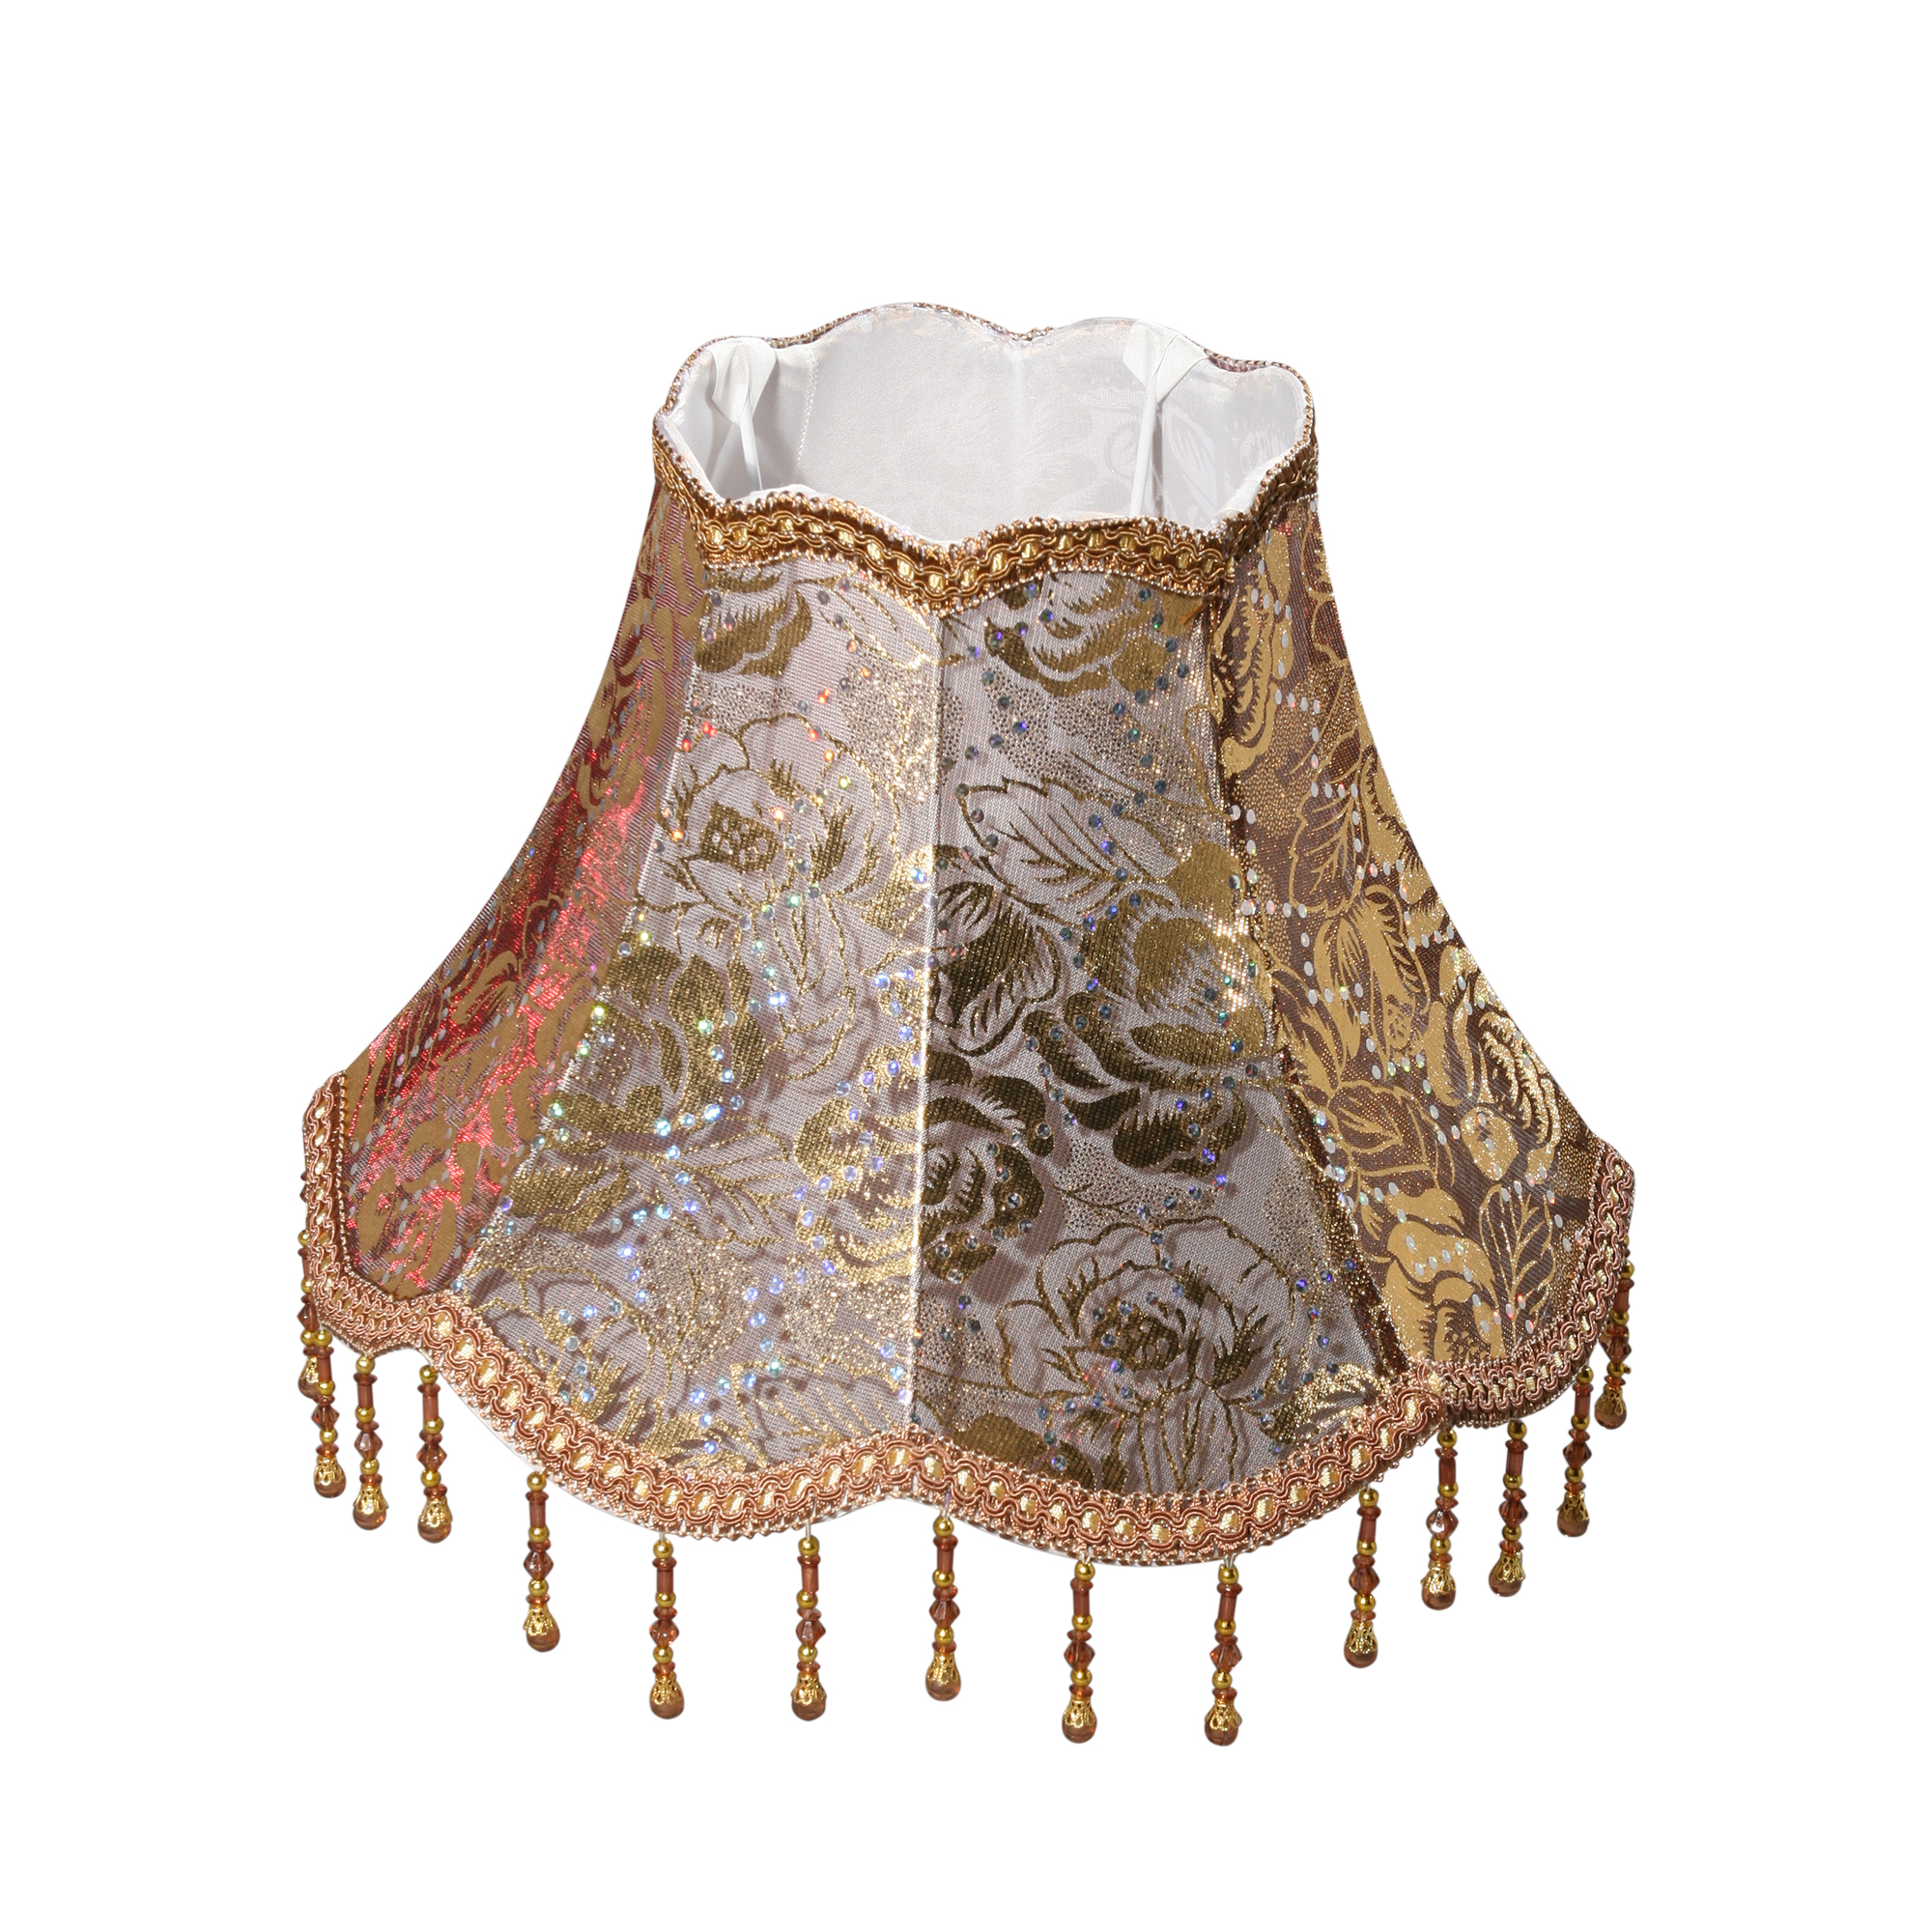 Купить Абажур ампир кольцо е27, 60вт, ткань/золотистый, d31 h17см Vitaluce, Китай, металл